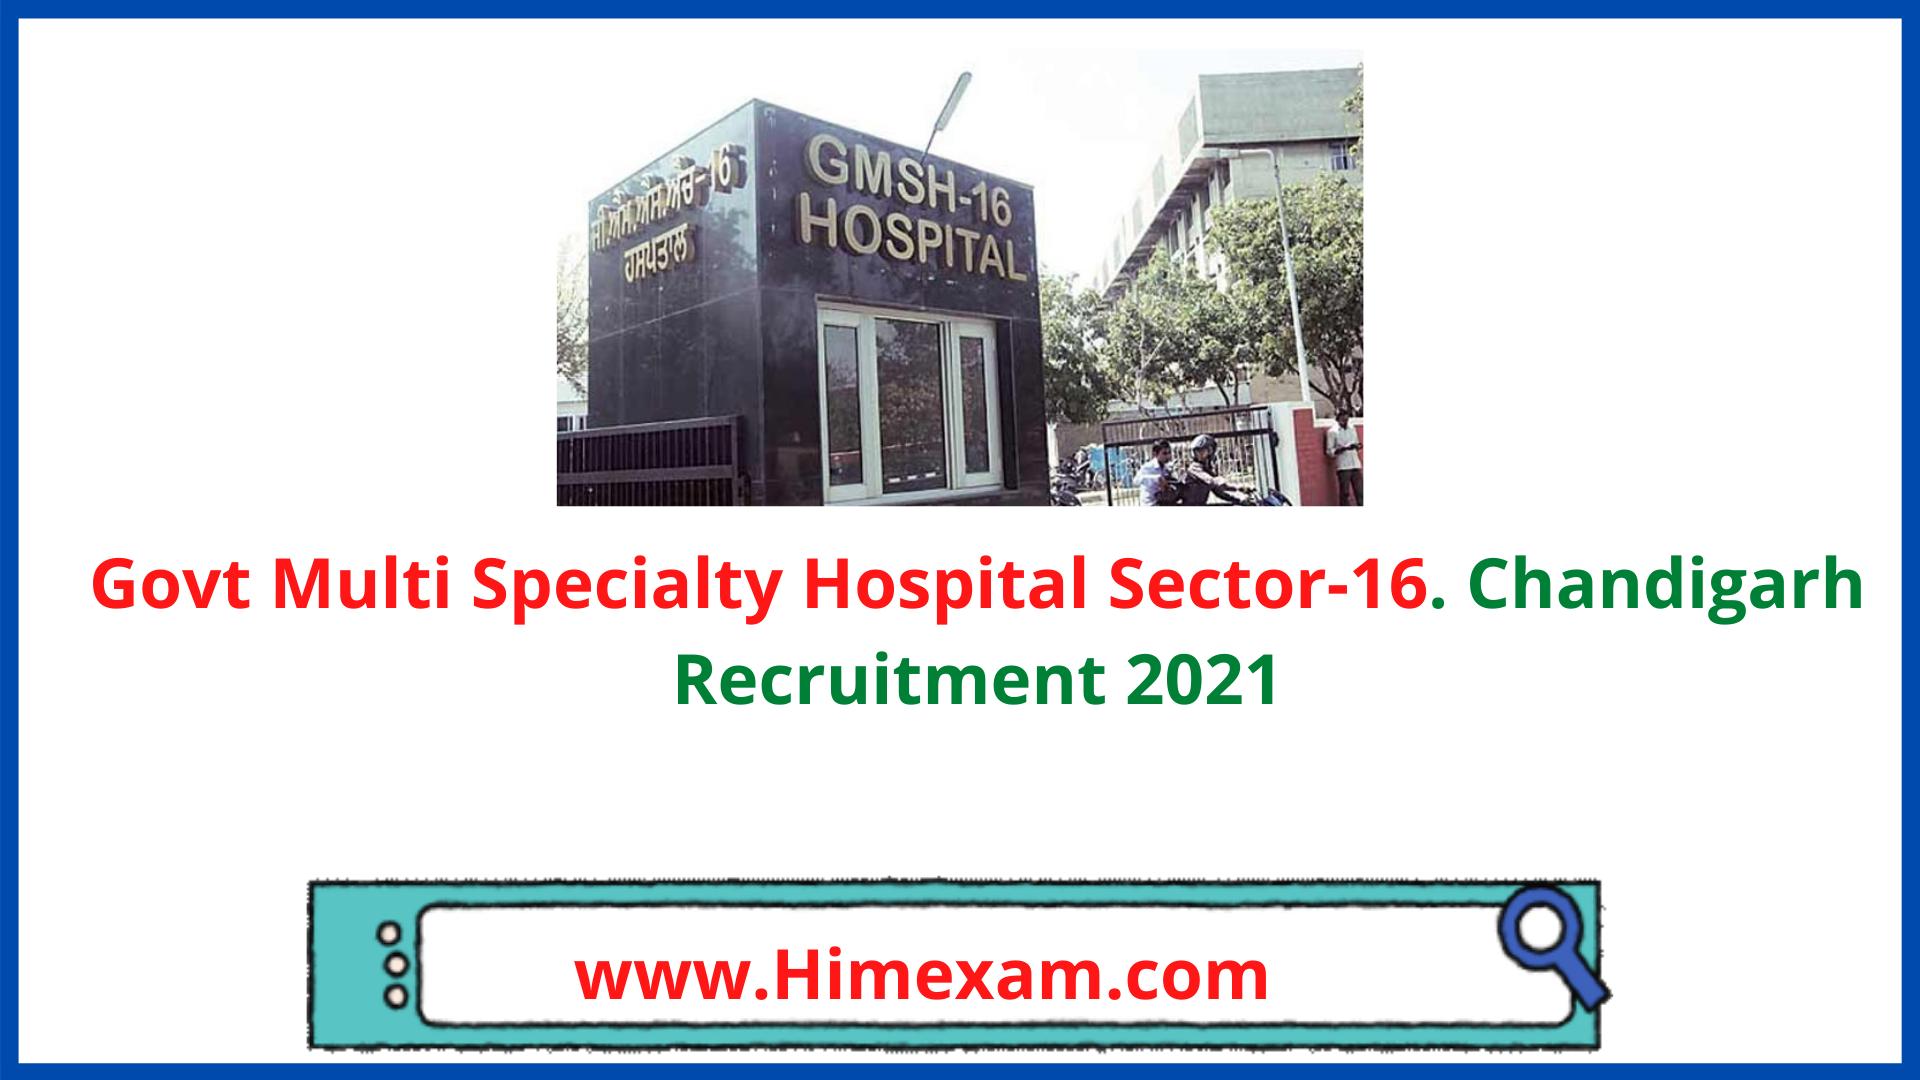 Govt Multi Specialty Hospital Sector-16. Chandigarh Recruitment 2021